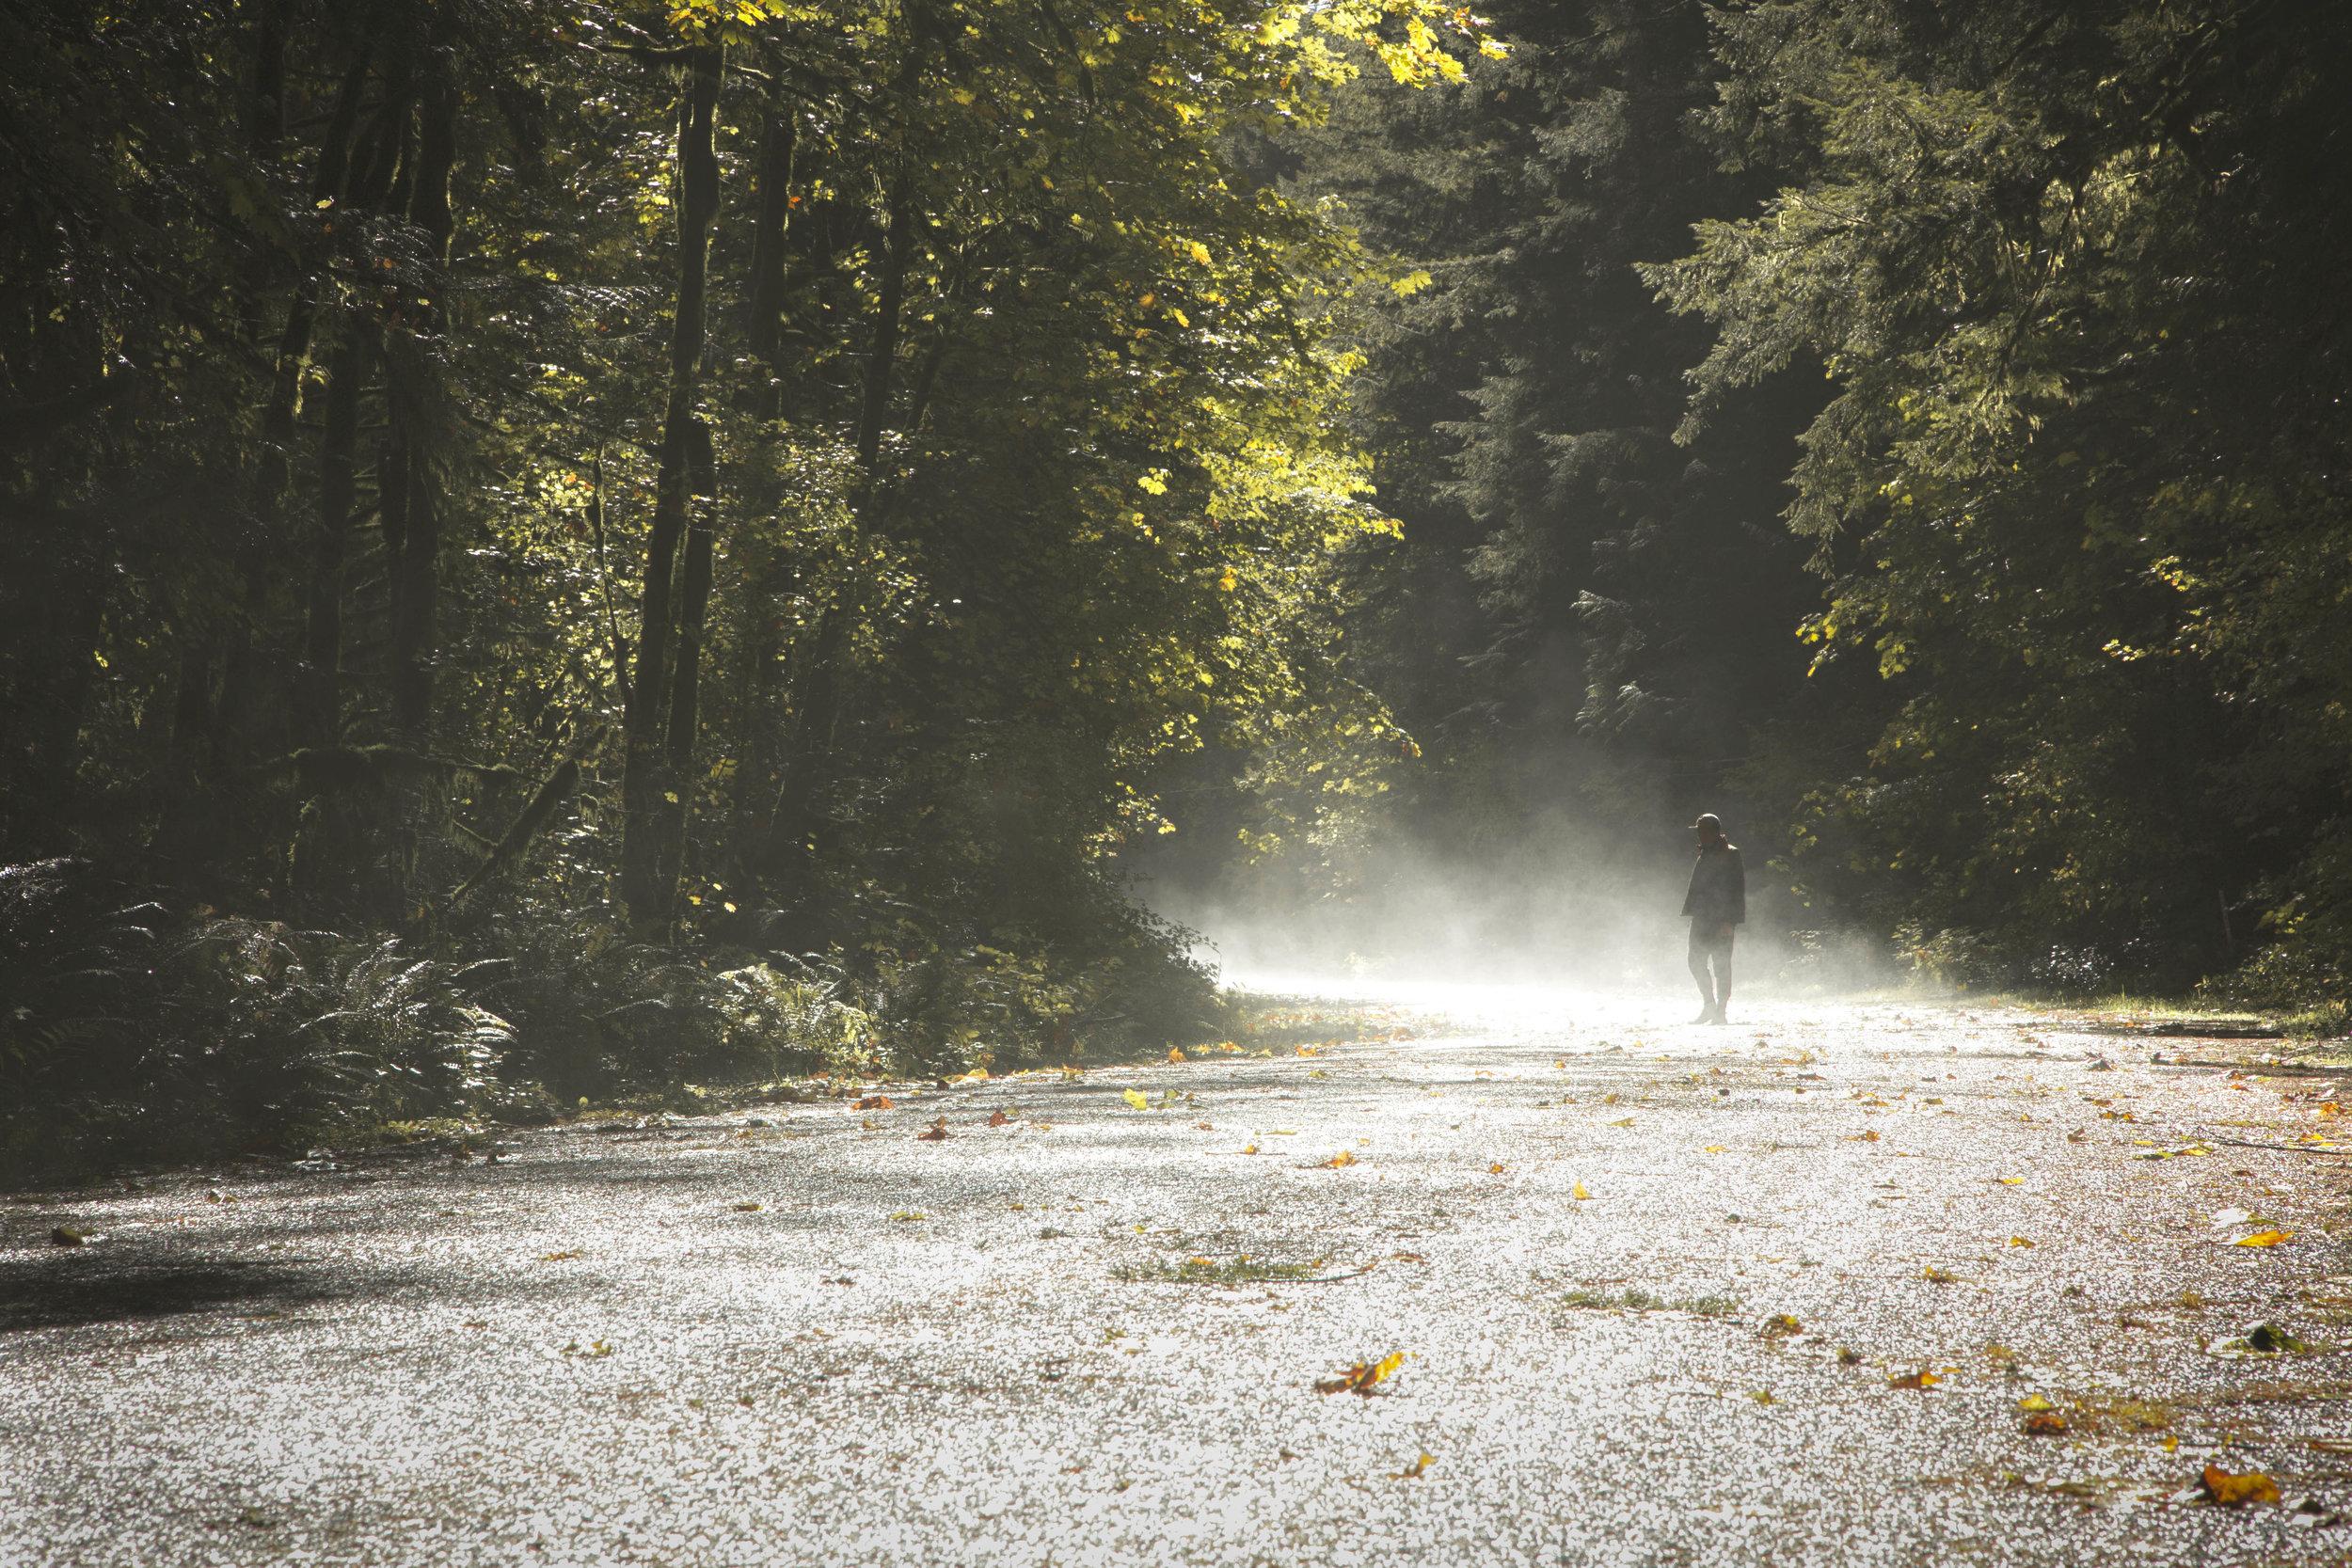 Kyle_fog_road.jpg